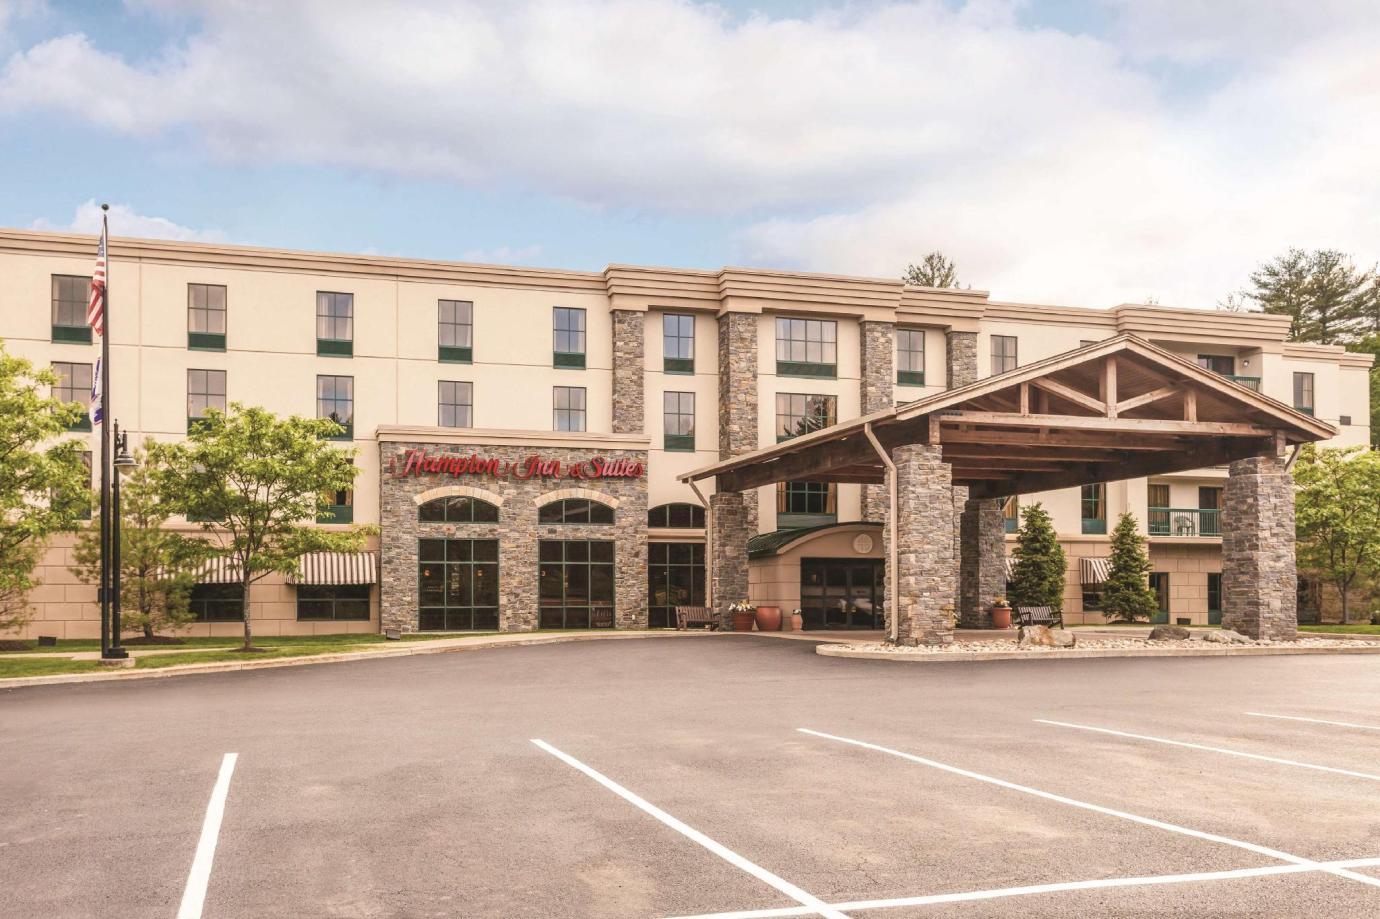 Hampton Inn and Suites Lake George Lake George (NY) New York United States